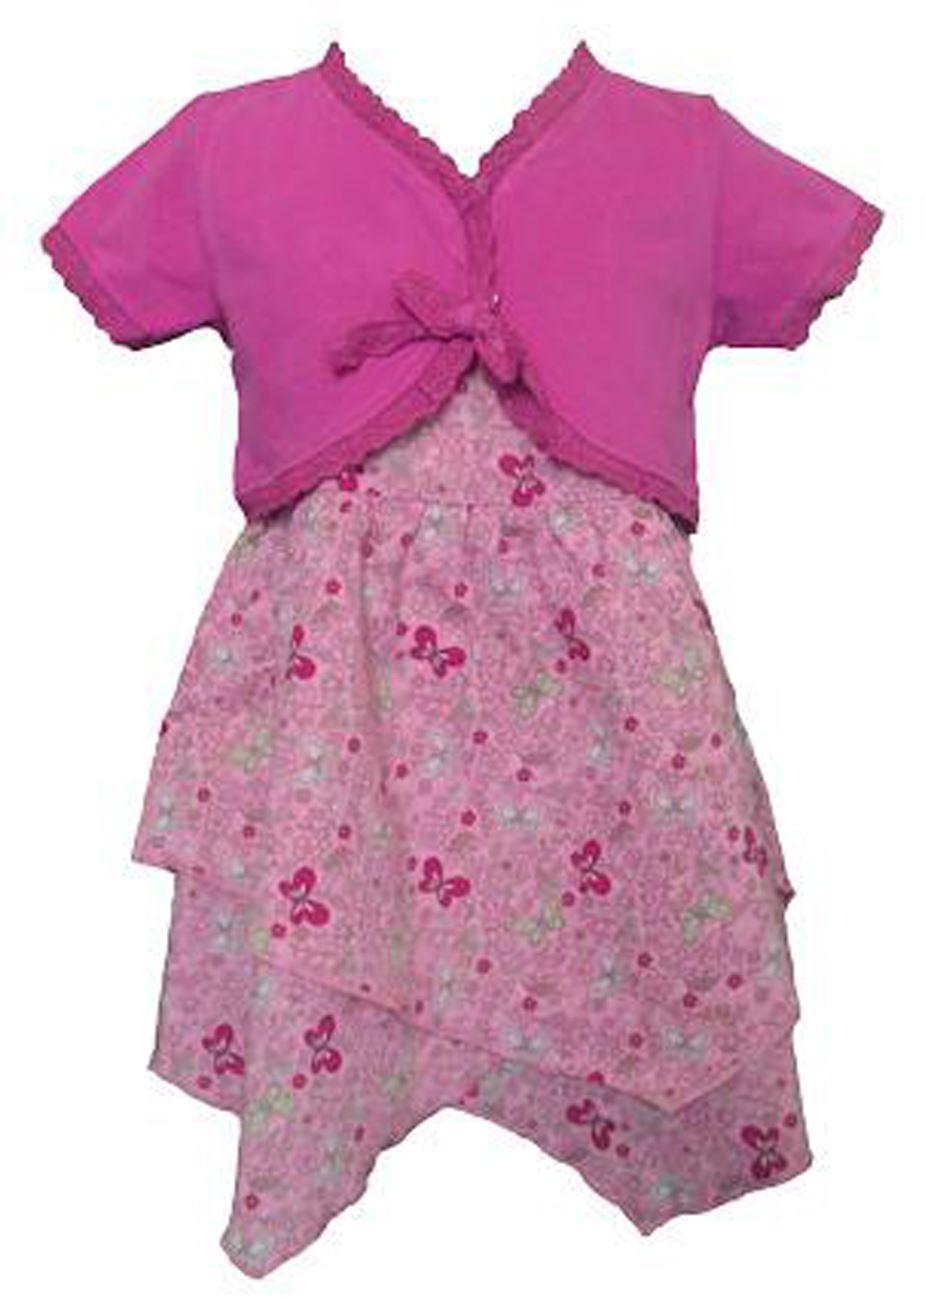 niña vestido de algodón & Chaqueta Bolero Set conjunto | eBay